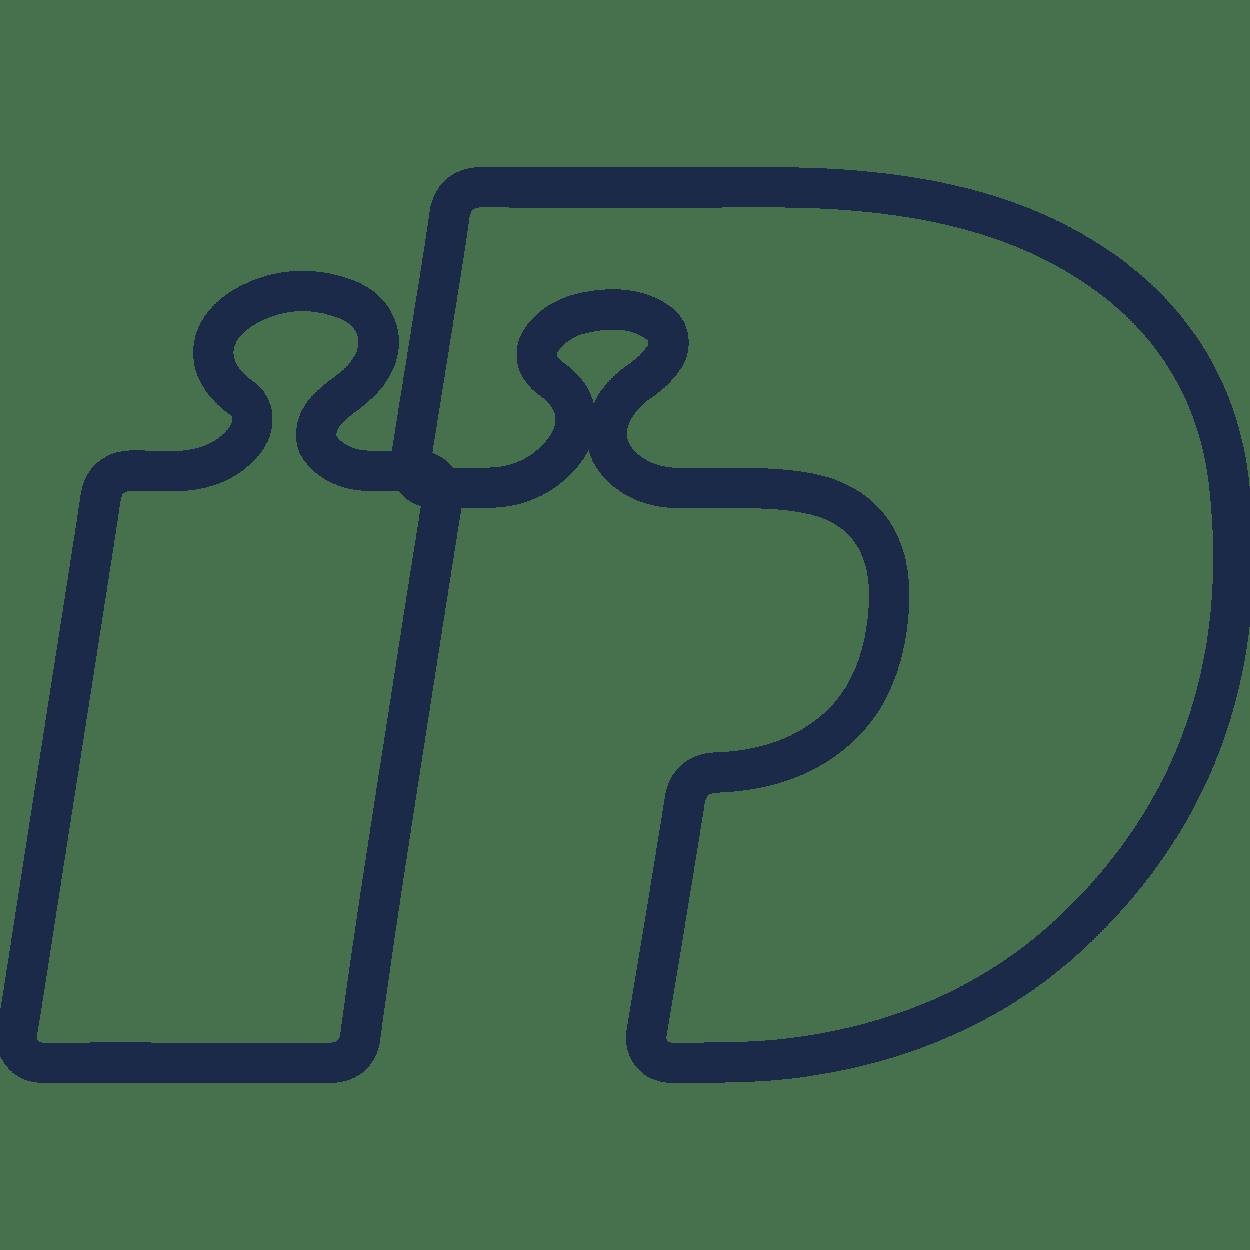 Ingen inloggning med BankID icon